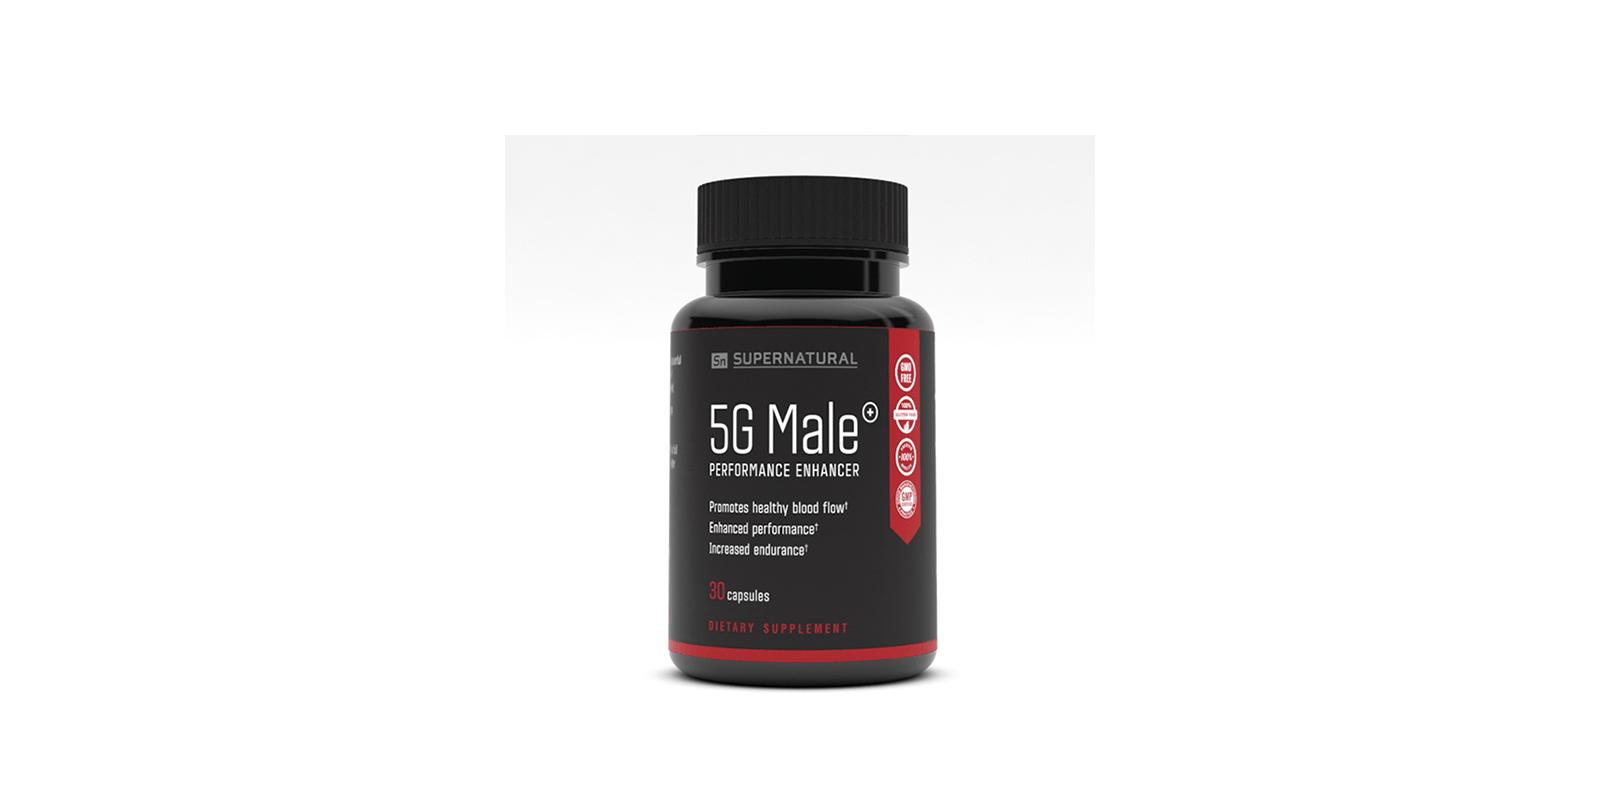 5g-male-performance-enhancer-reviews